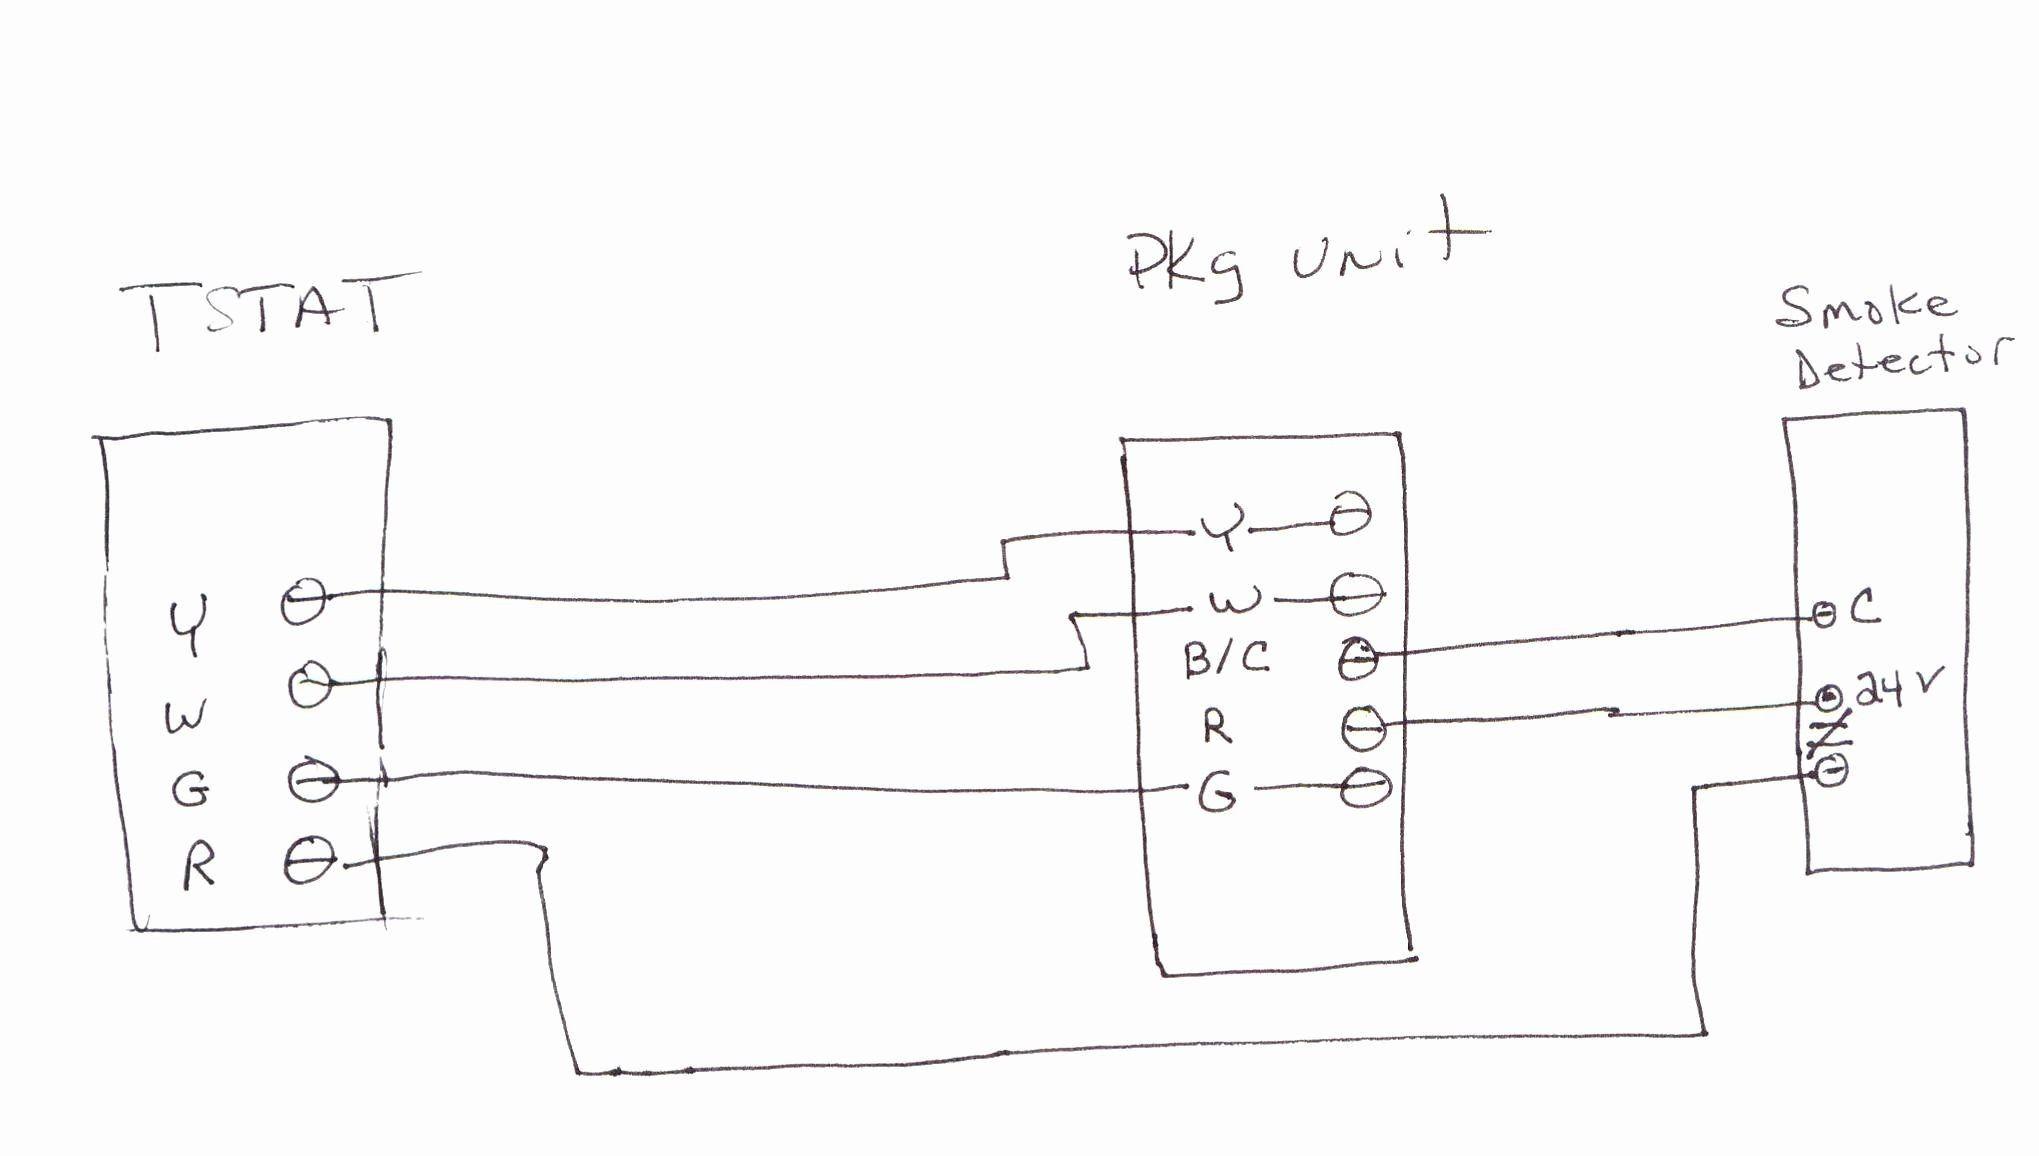 New Wiring Diagram For Burglar Alarm System  Diagram